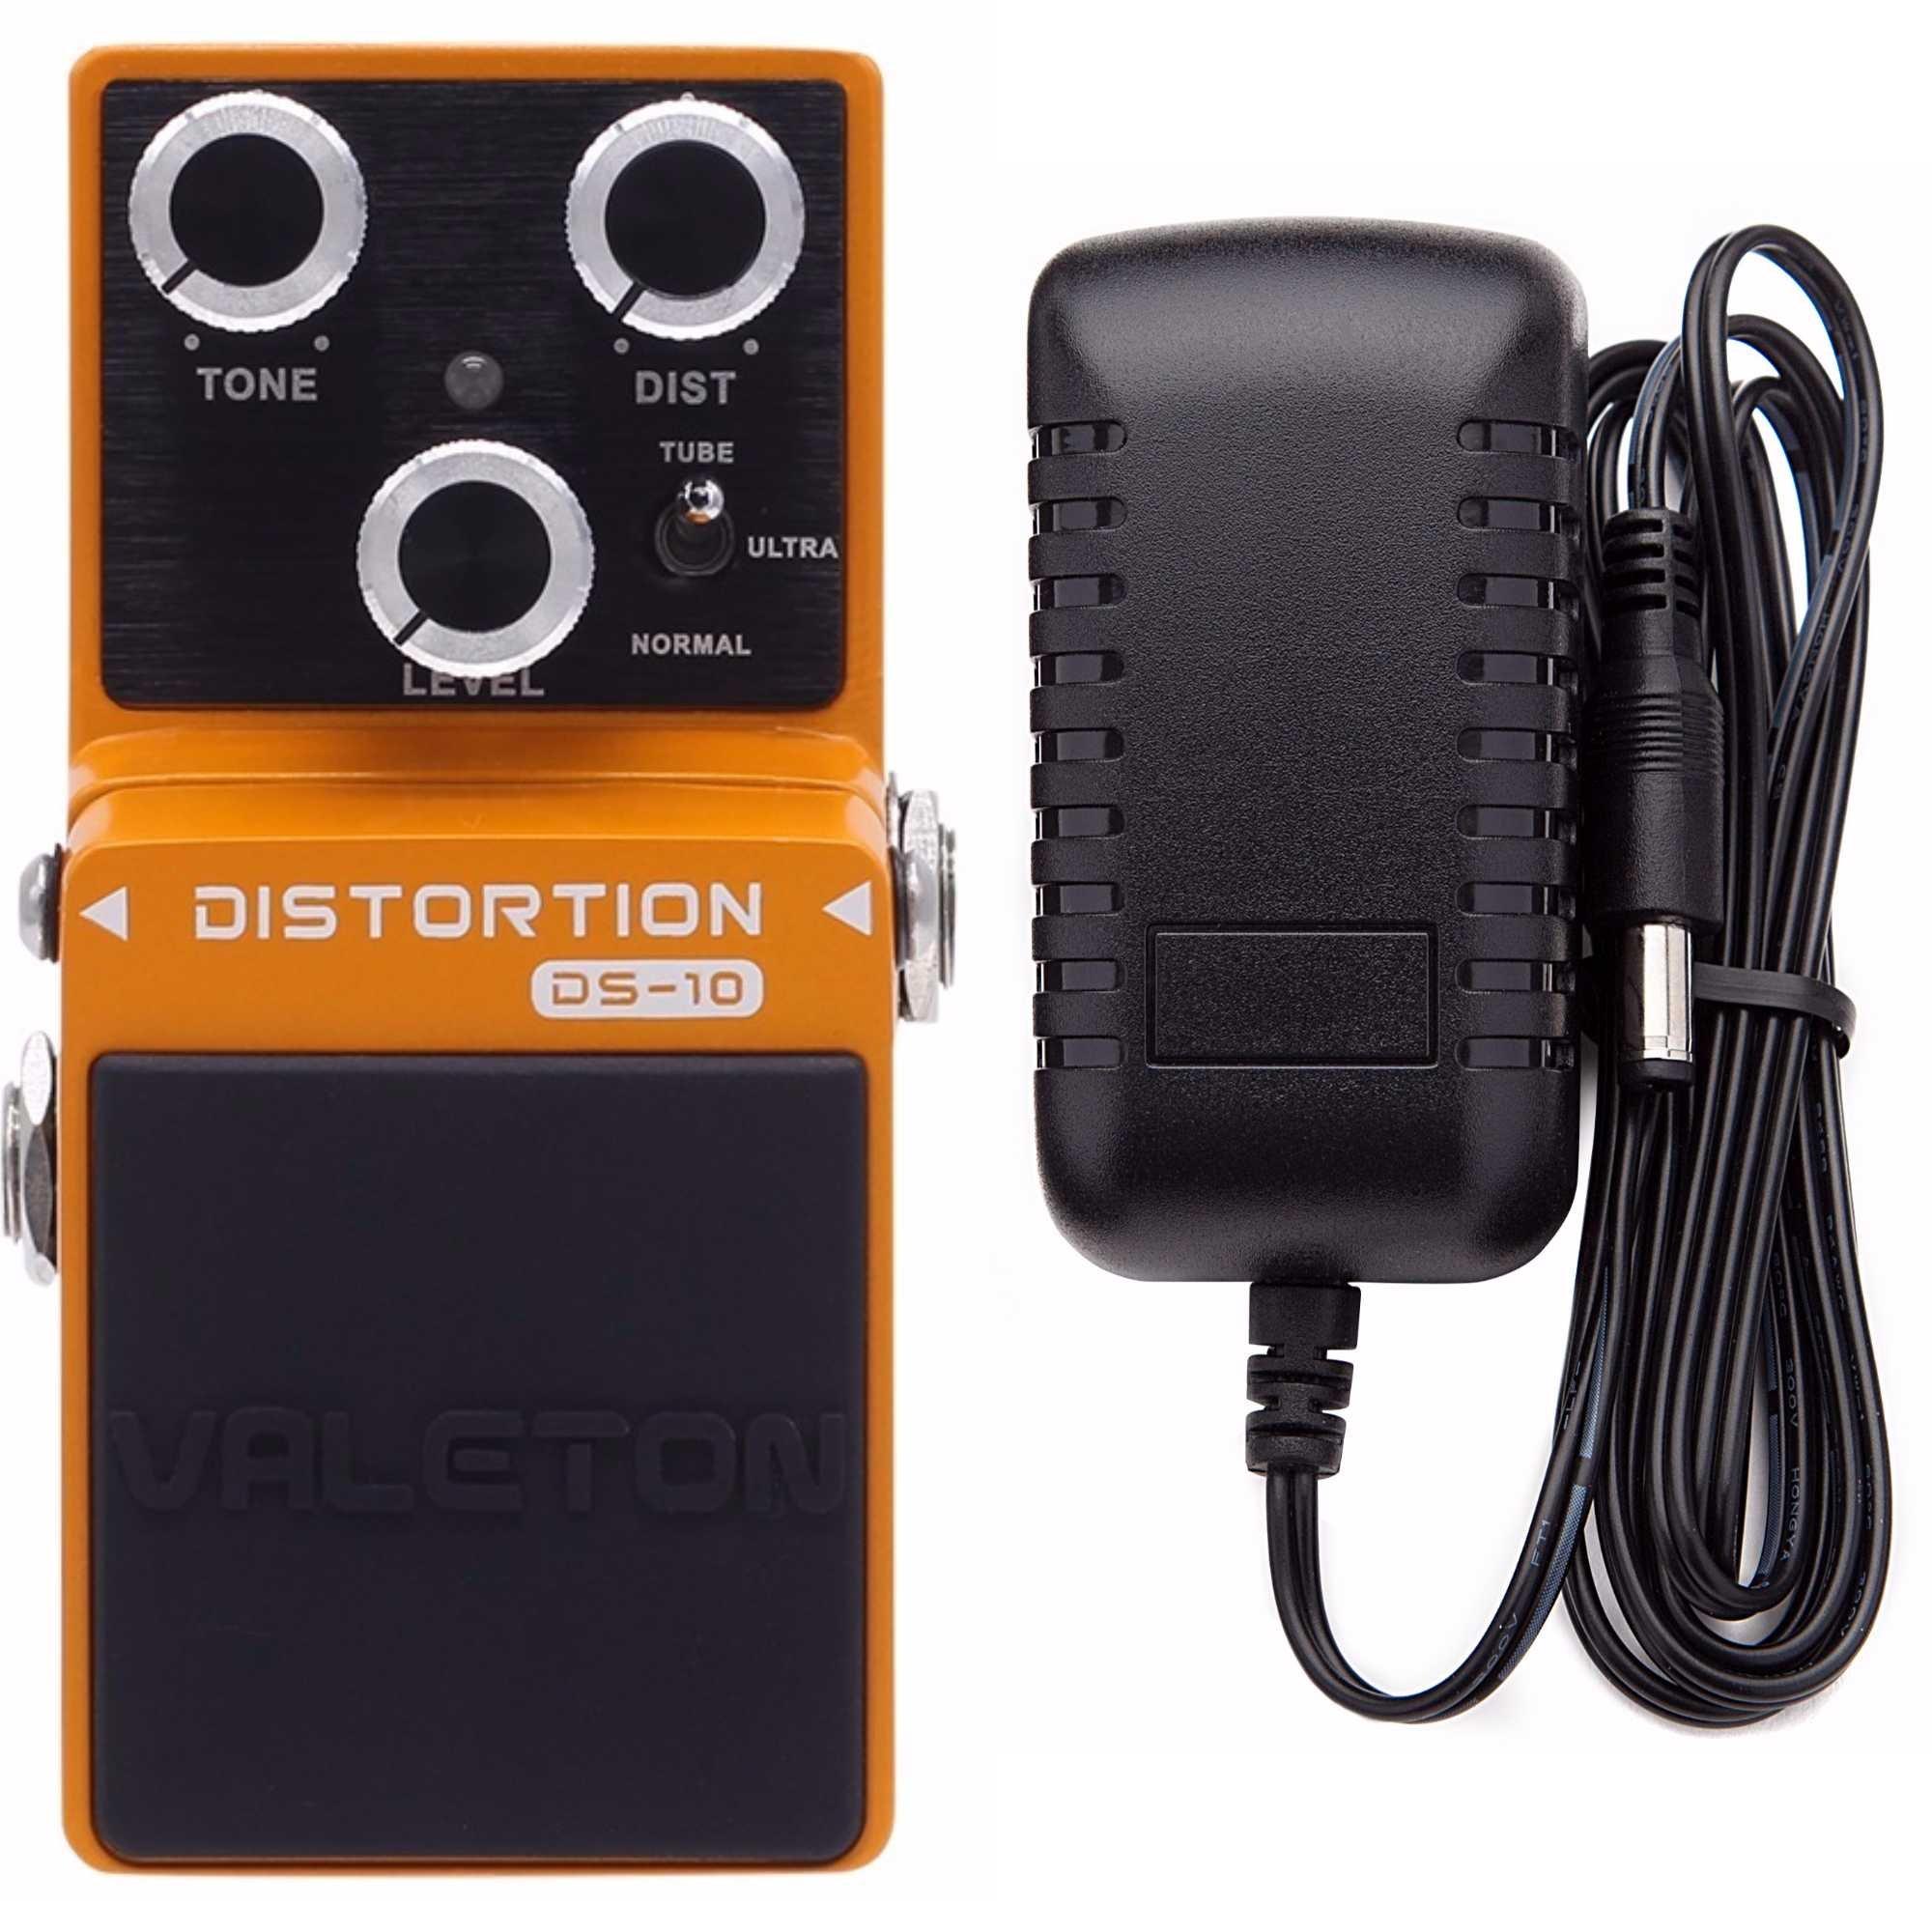 Valeton Loft DS-10 Distortion Pedal Includes Valeton 9V DC 1 Amp Power Supply by Valeton